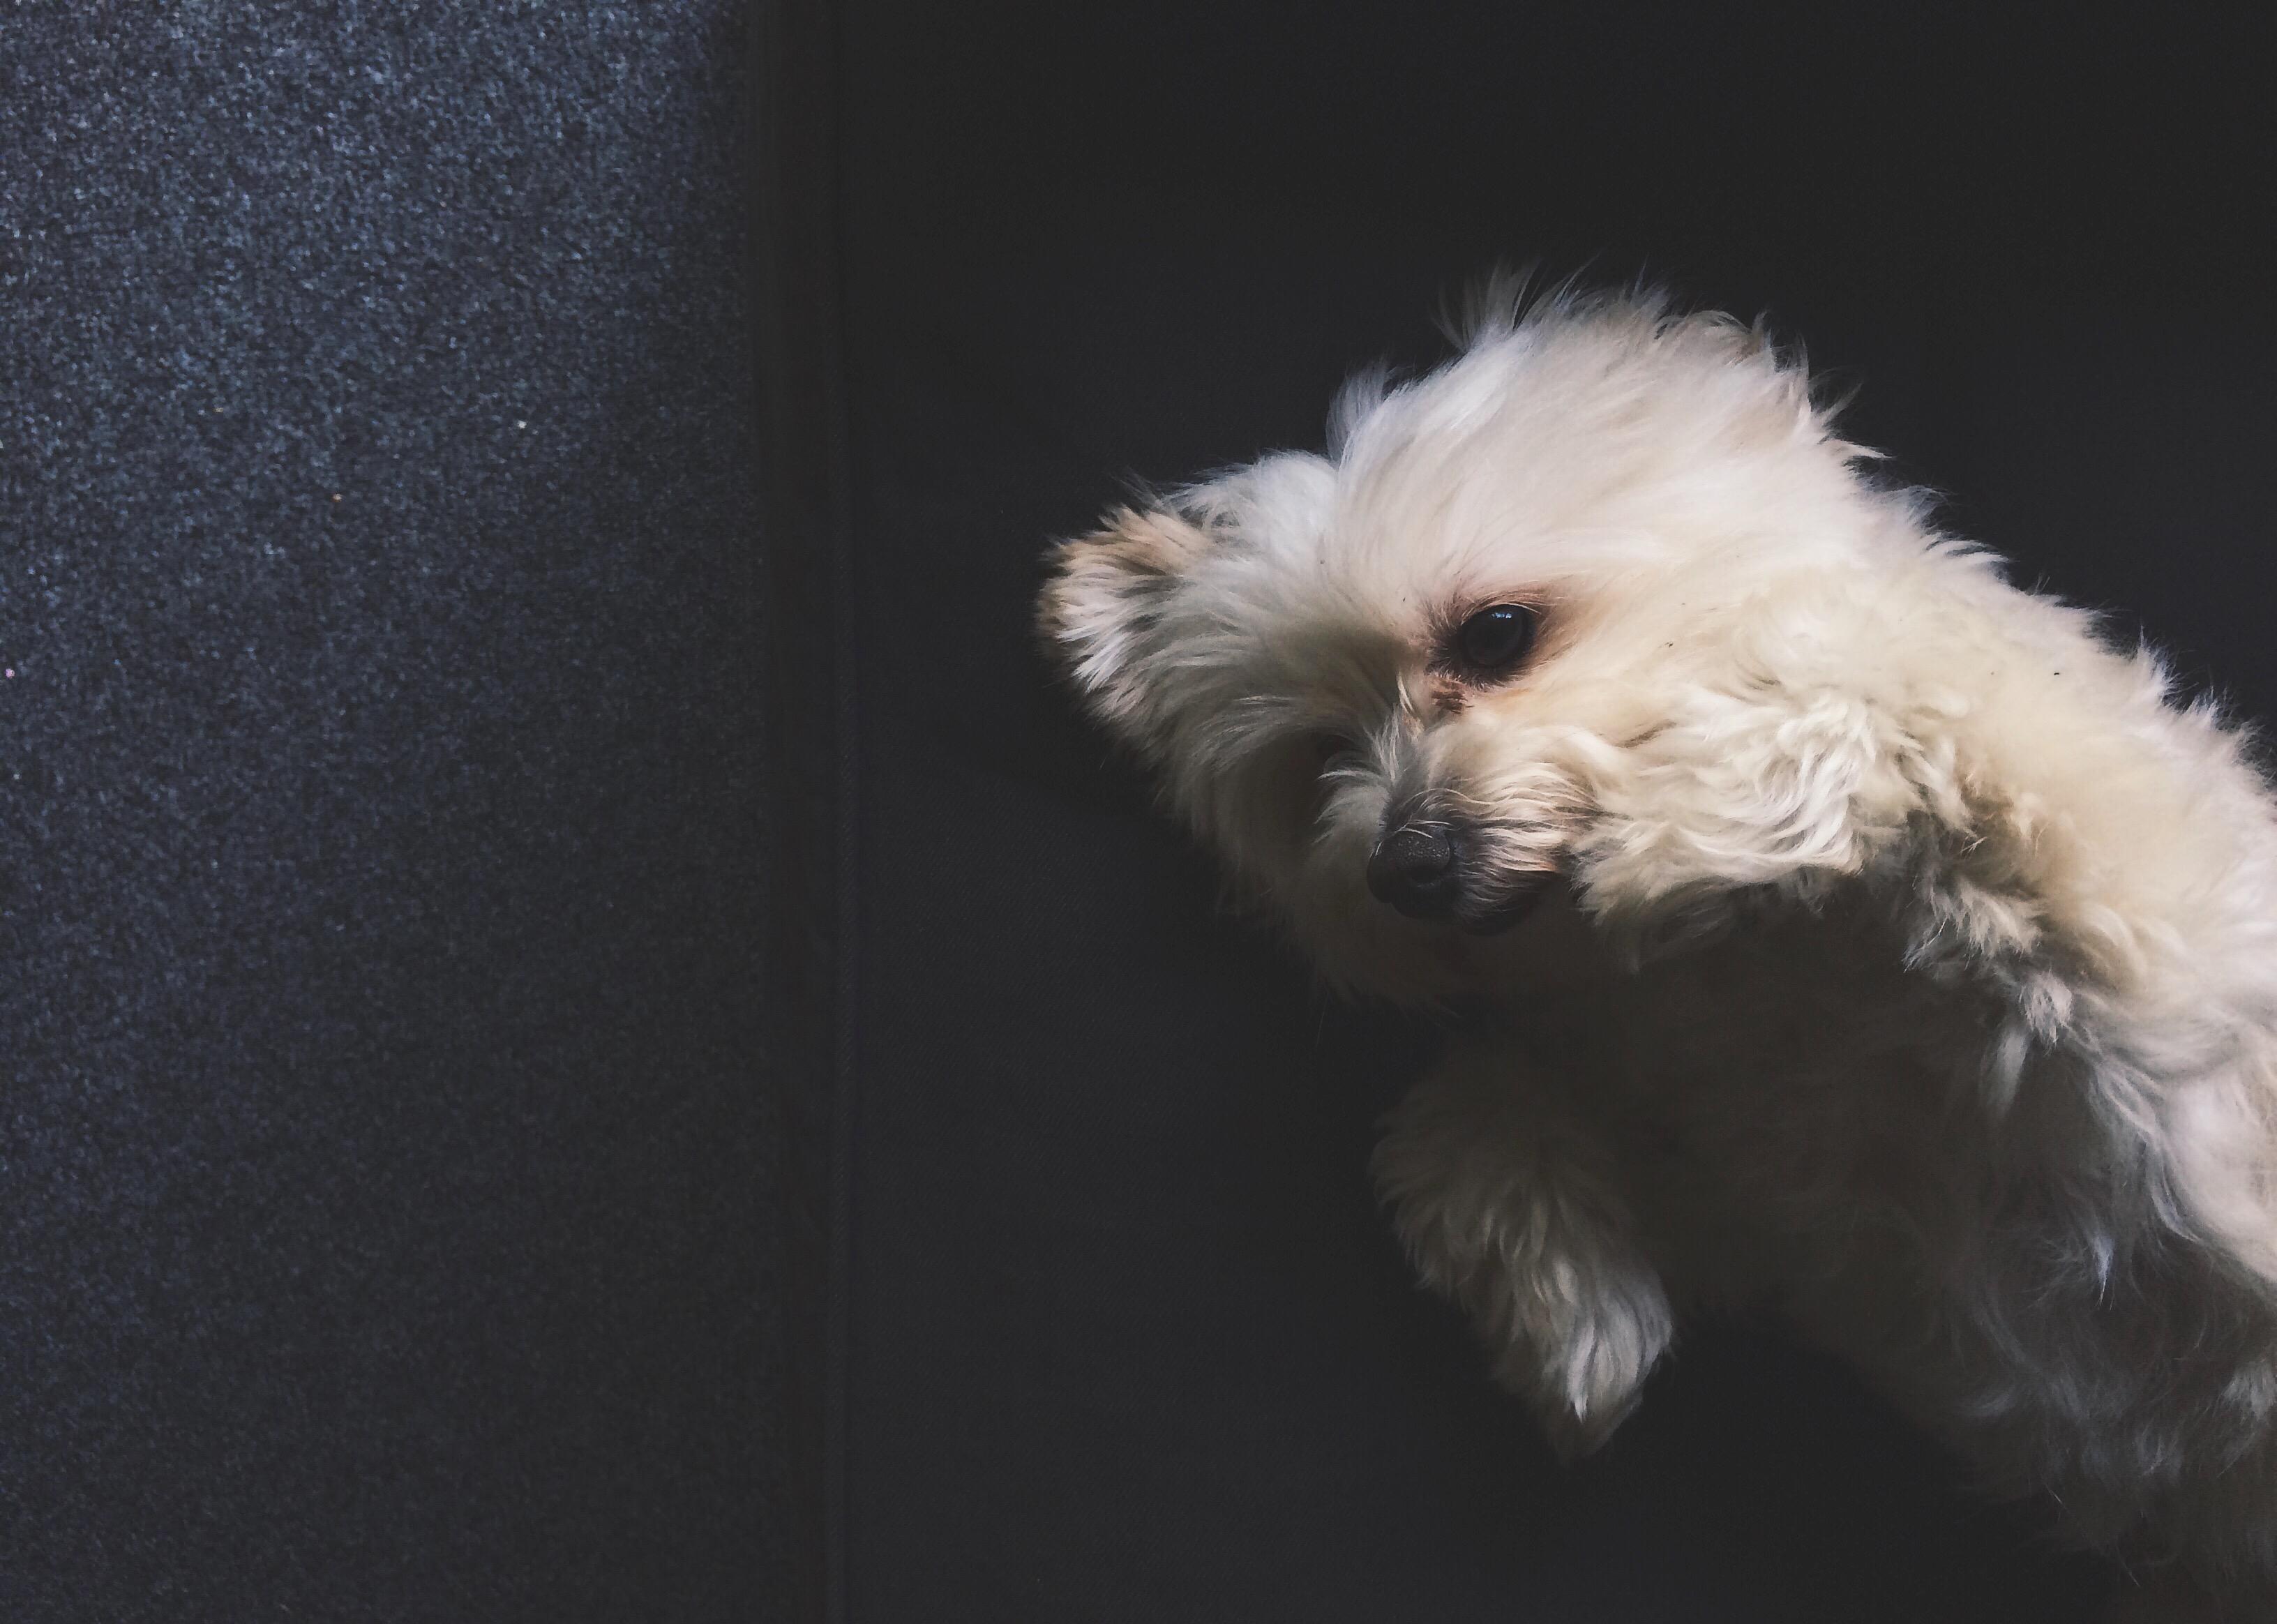 7 Things, Bramble & Thorn, Rain, Storm, Moody, ziggy, dog, cute